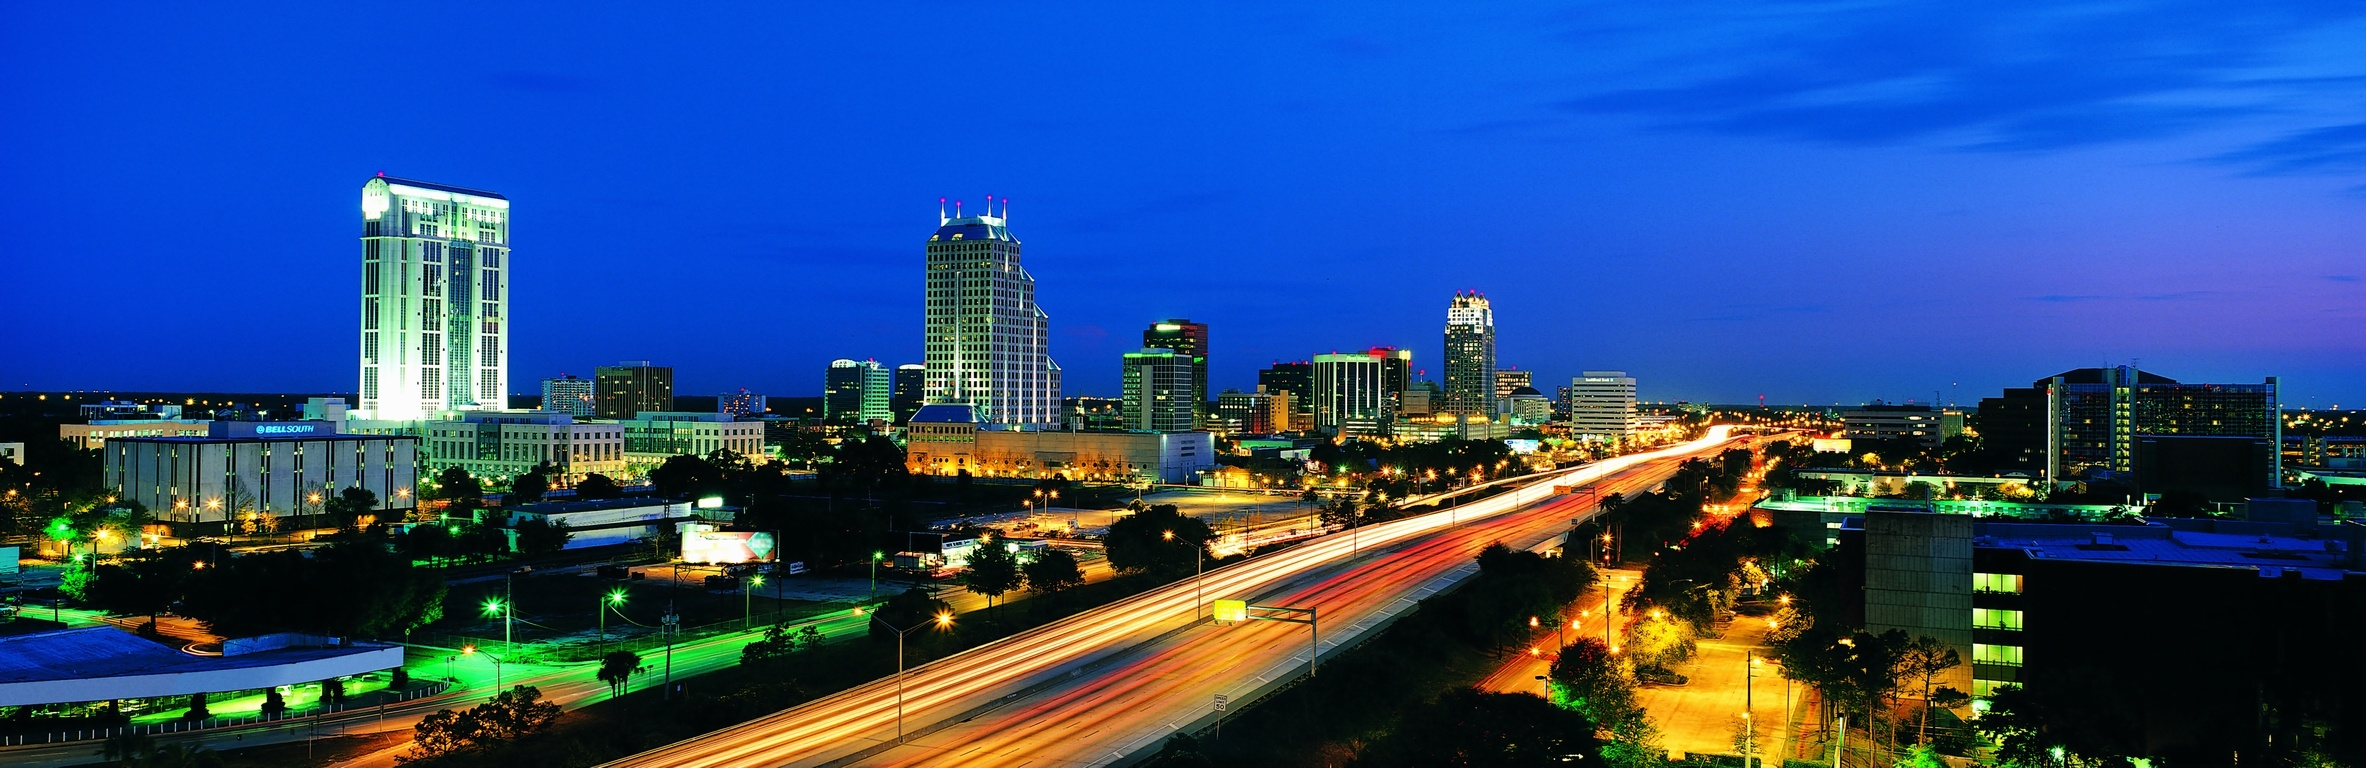 16 Cities Of Usa With Astonishing Night Views Amp Skylines